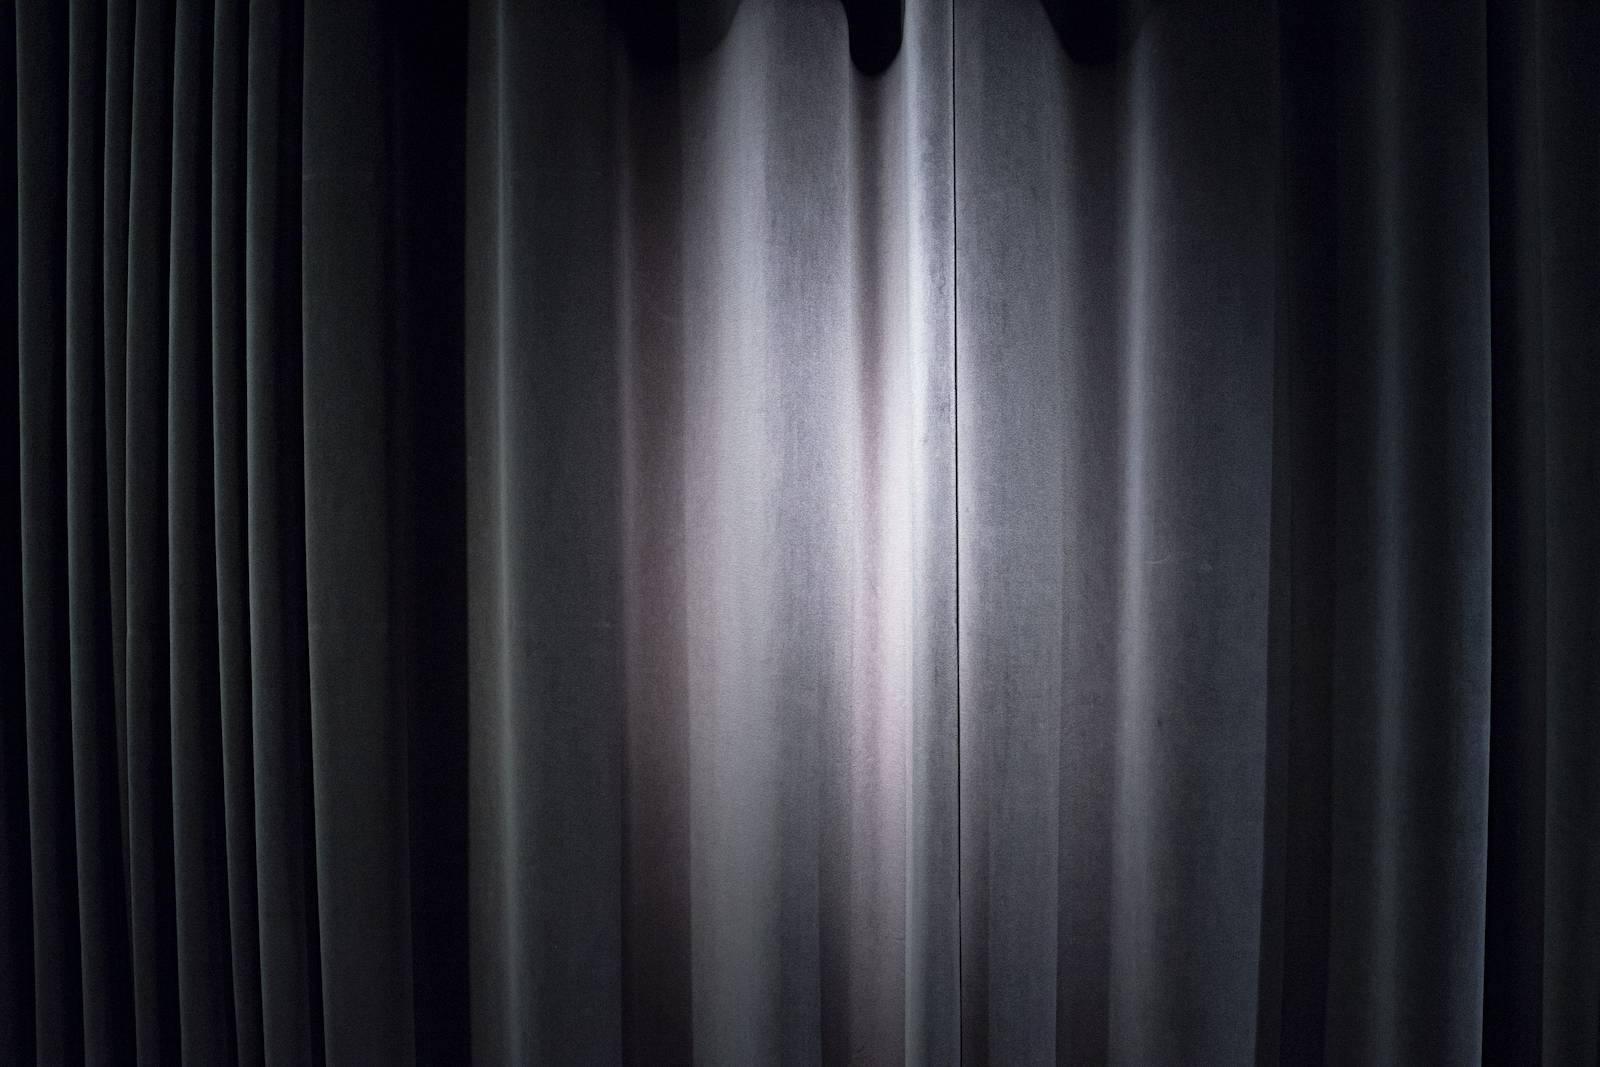 Stage curtain 2, 2017/2019. Archival inkjet print, 39,5 x 60 cm. Ed. 5 + 1AP